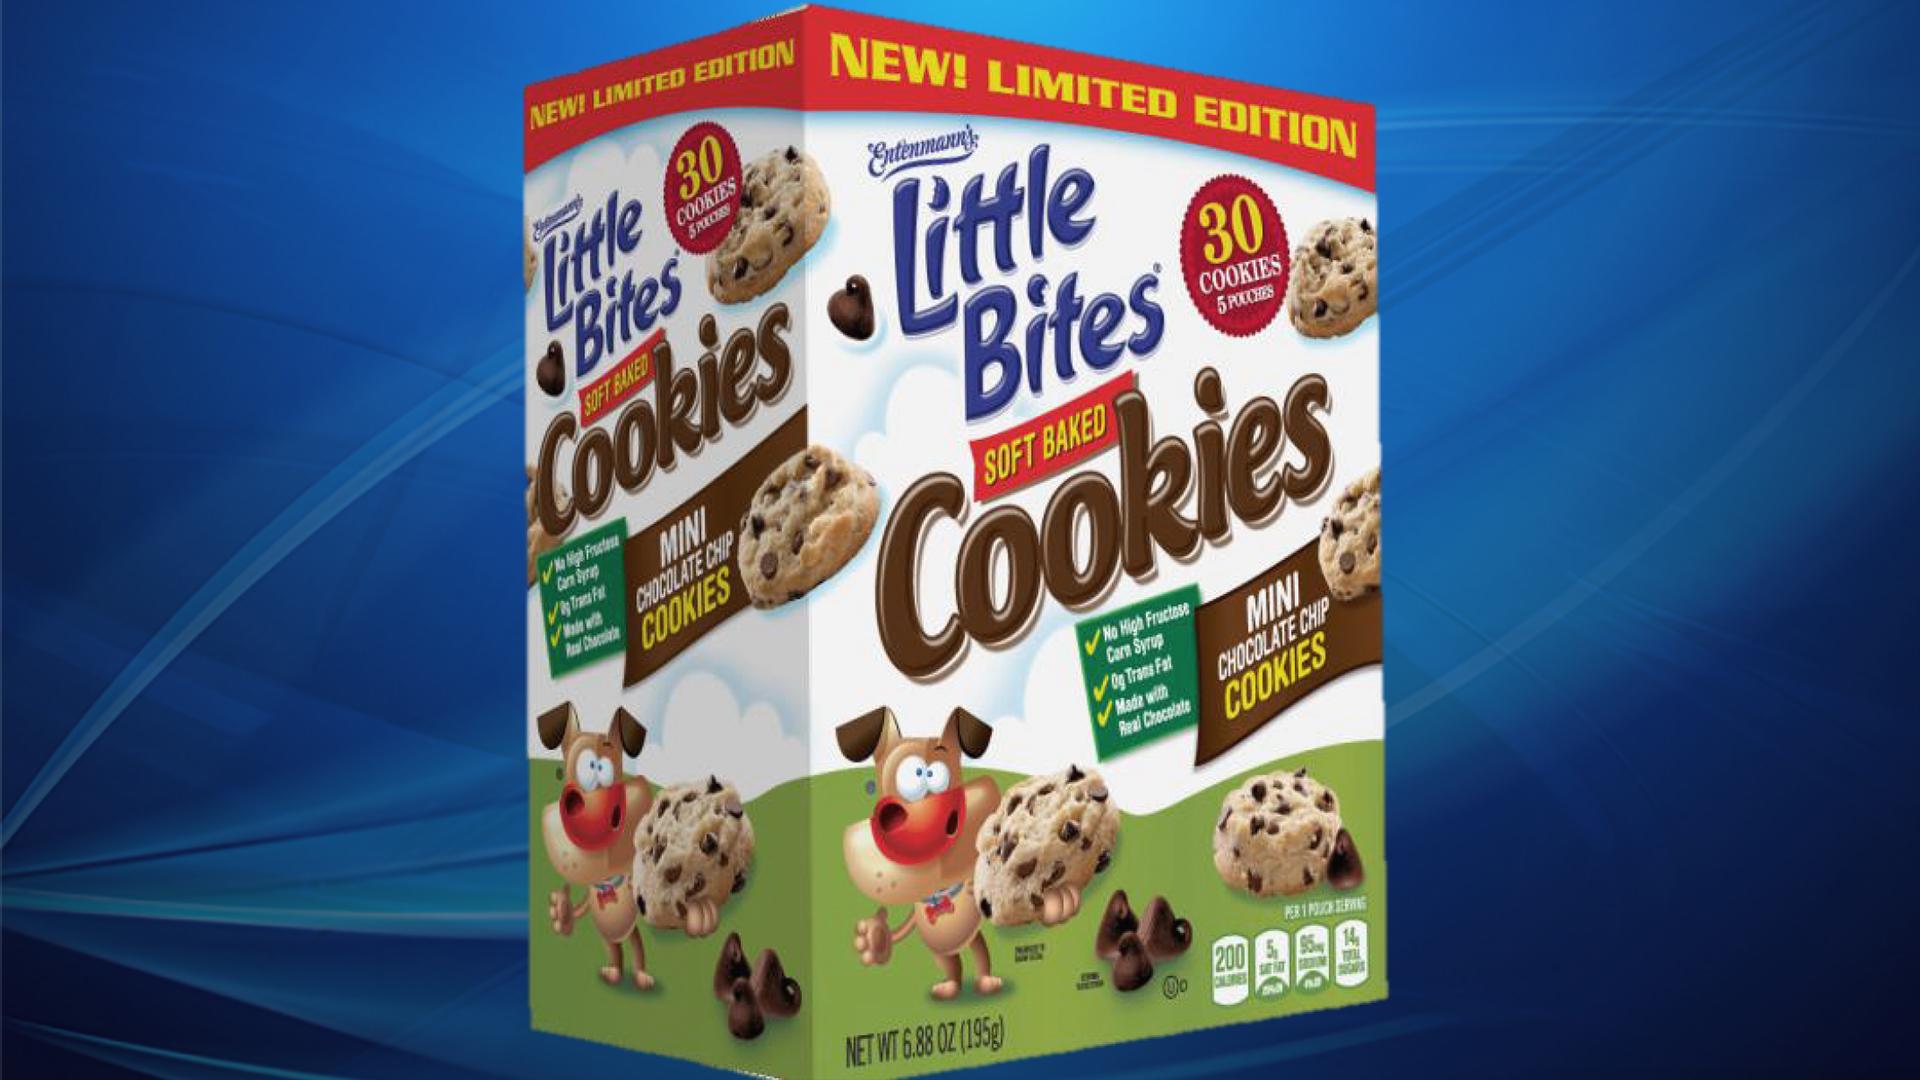 Entenmann's Little Bites cookies recalled due to blue plastic